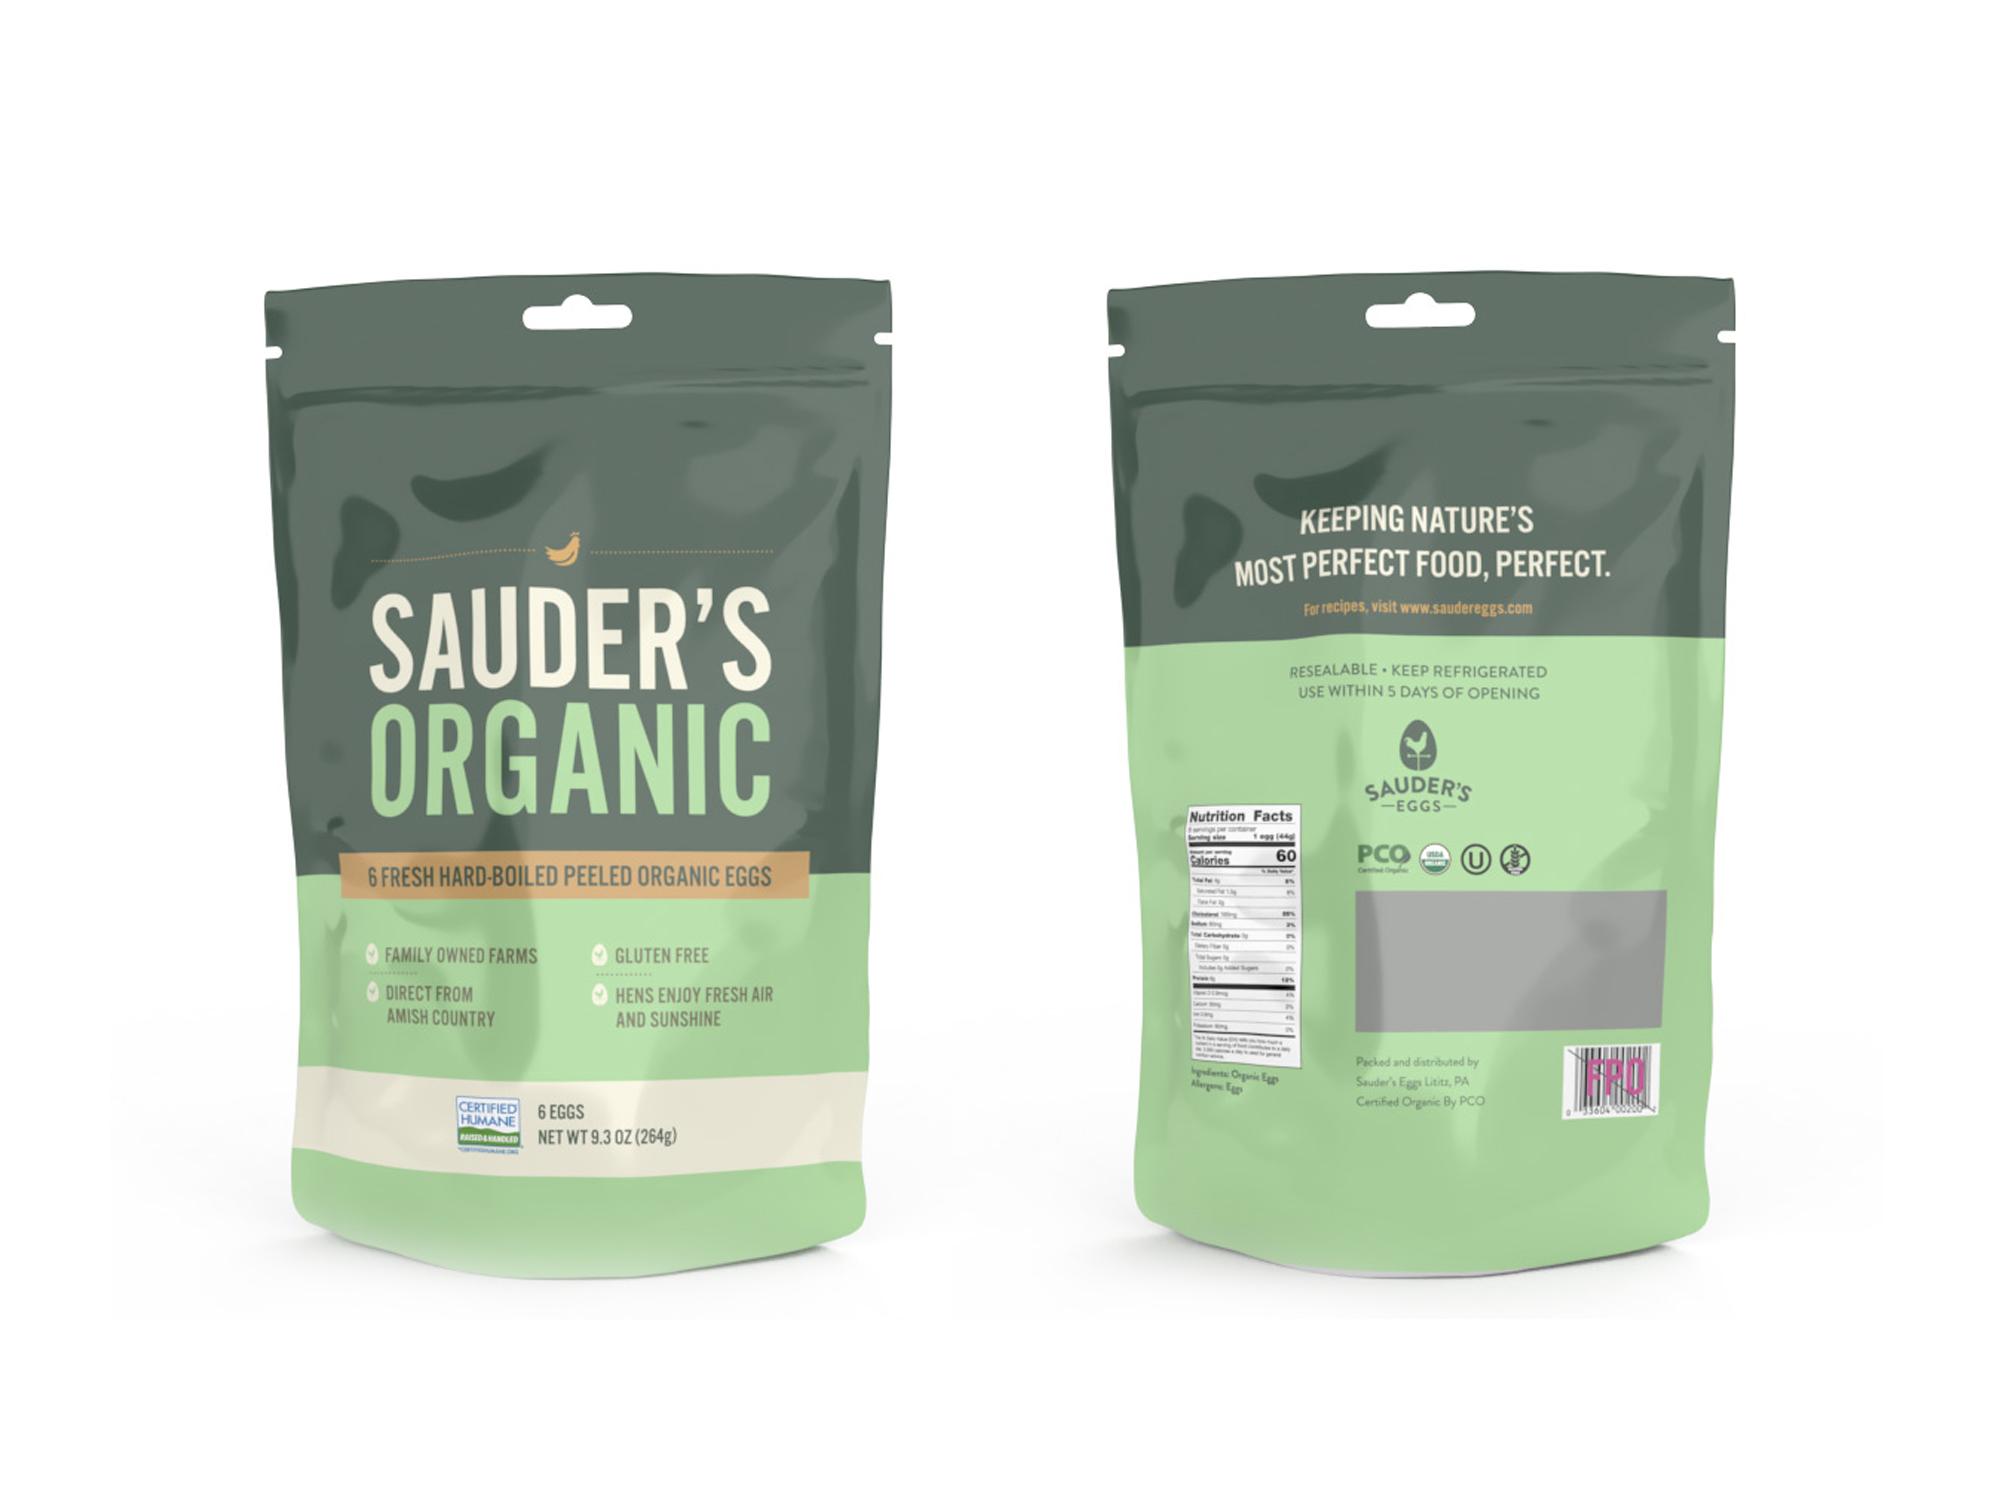 sauders-organic-pouch